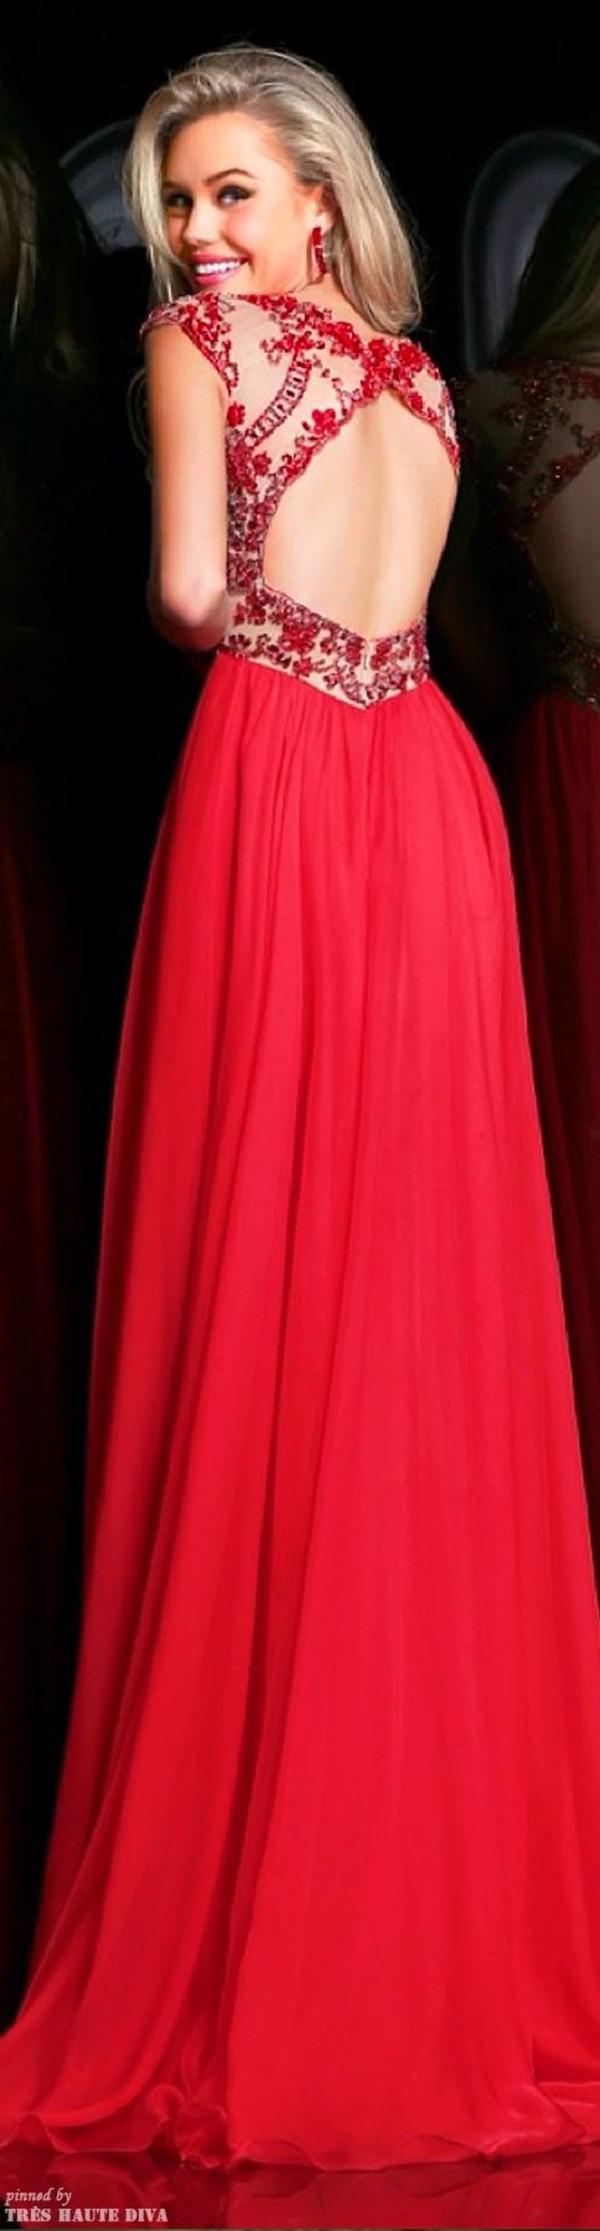 dress red dress lace dress beading keyhole dress